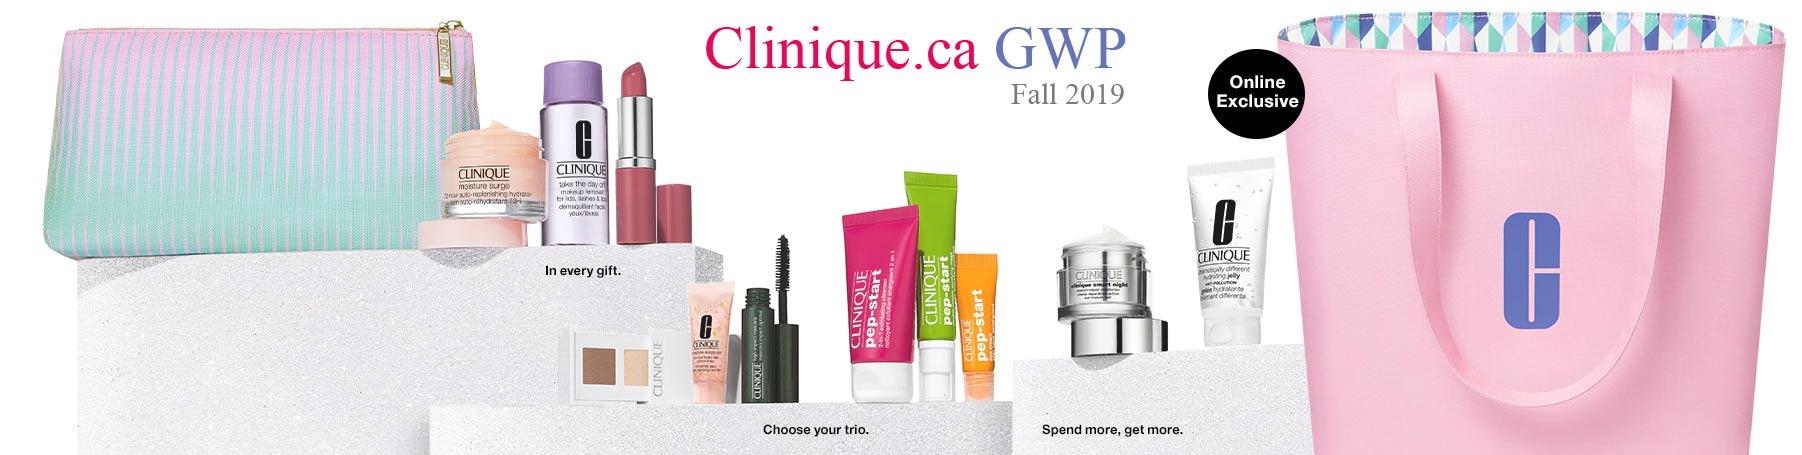 Clinique Bonus Times In Canada 2020 2021